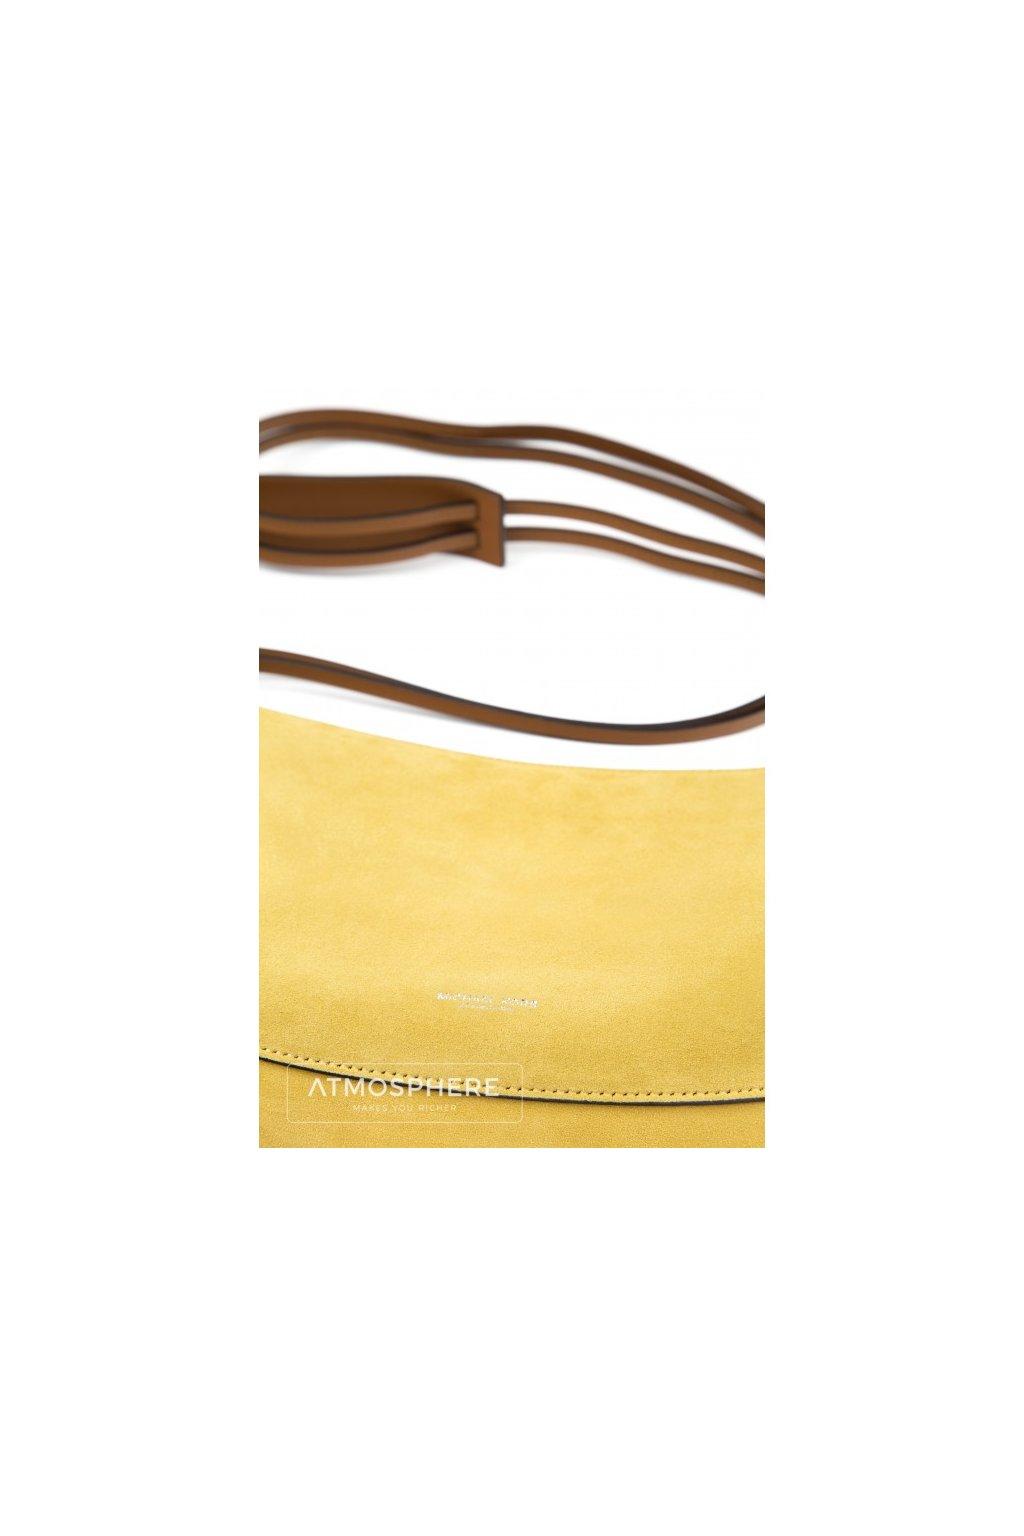 ... kabelka michael kors sedona medium leather shoulder bag butter eshopat  cz 3 856427f0be8